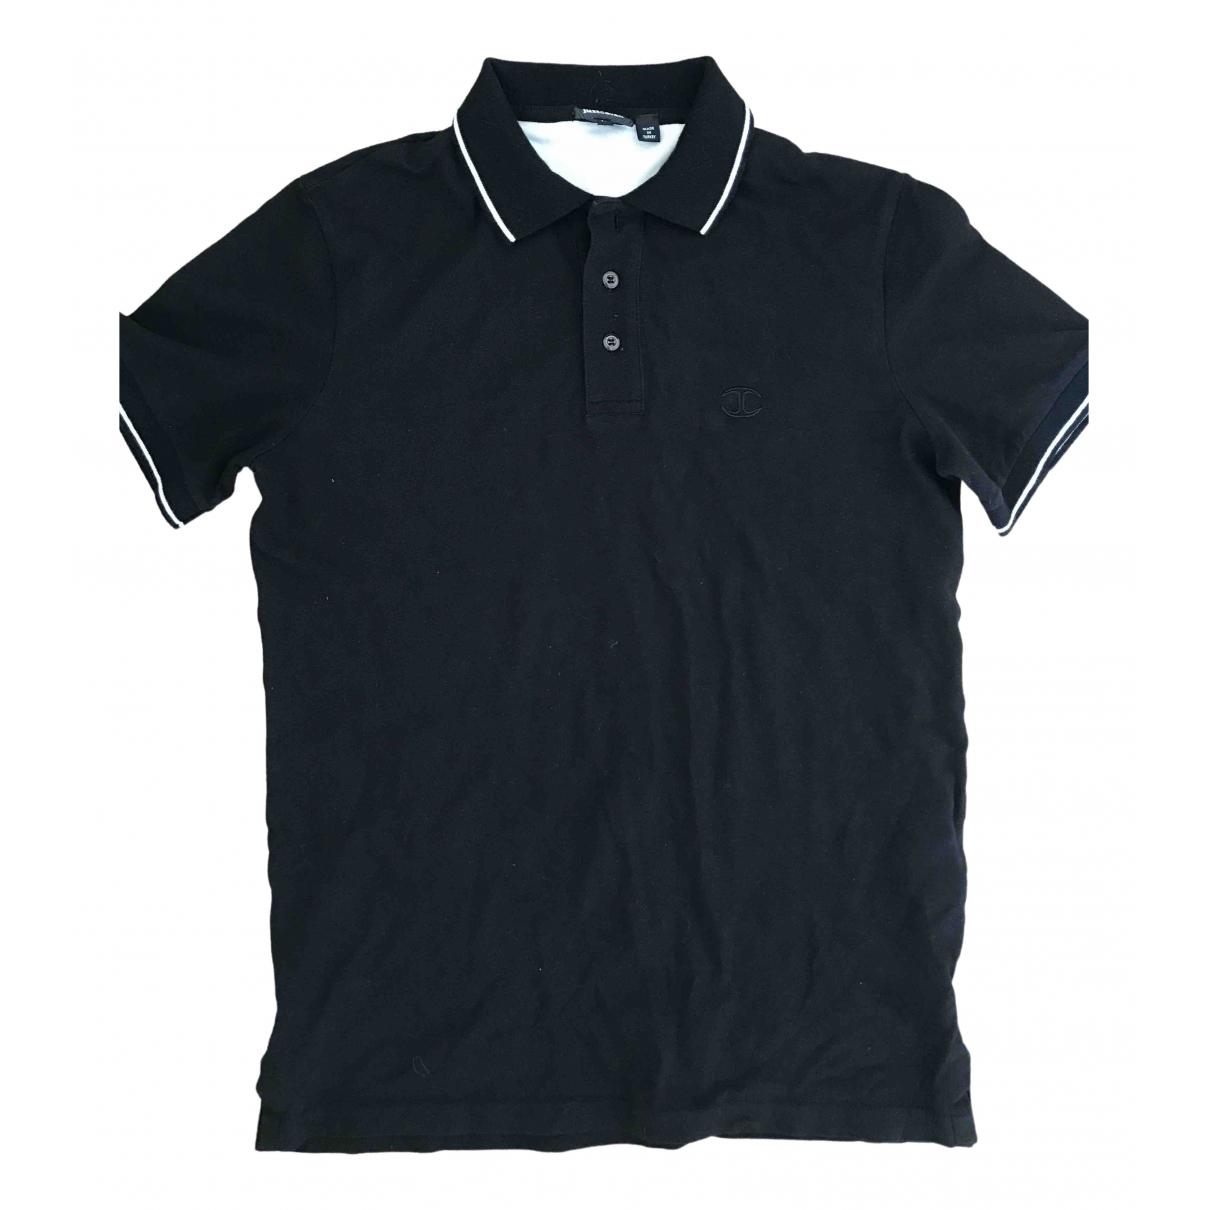 Just Cavalli \N Black Cotton Polo shirts for Men M International